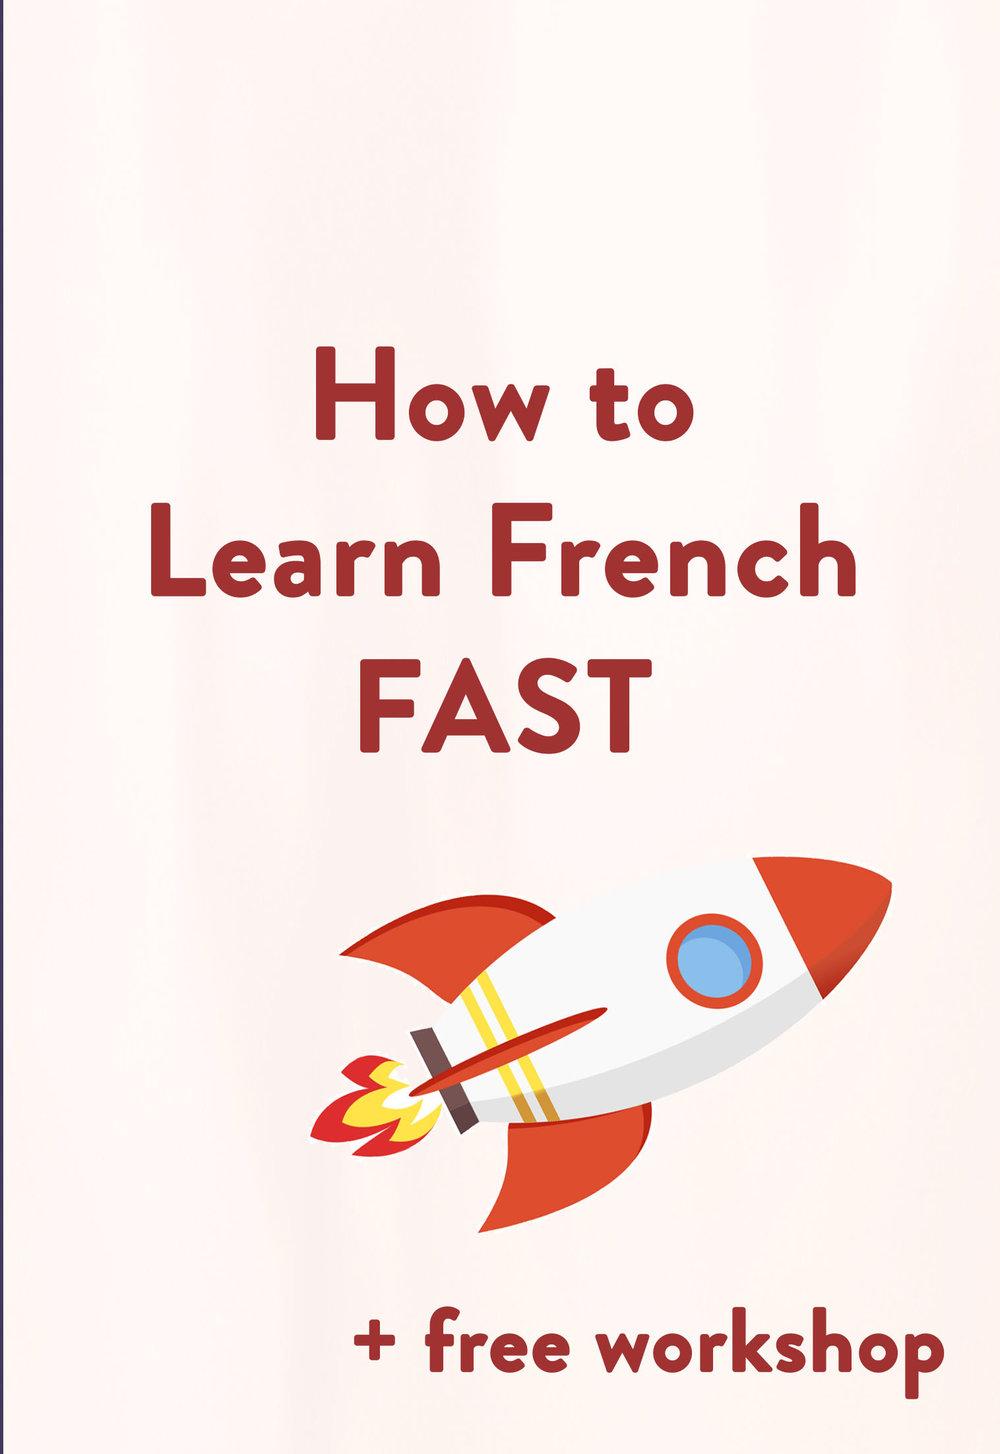 learn french fast 2.jpg